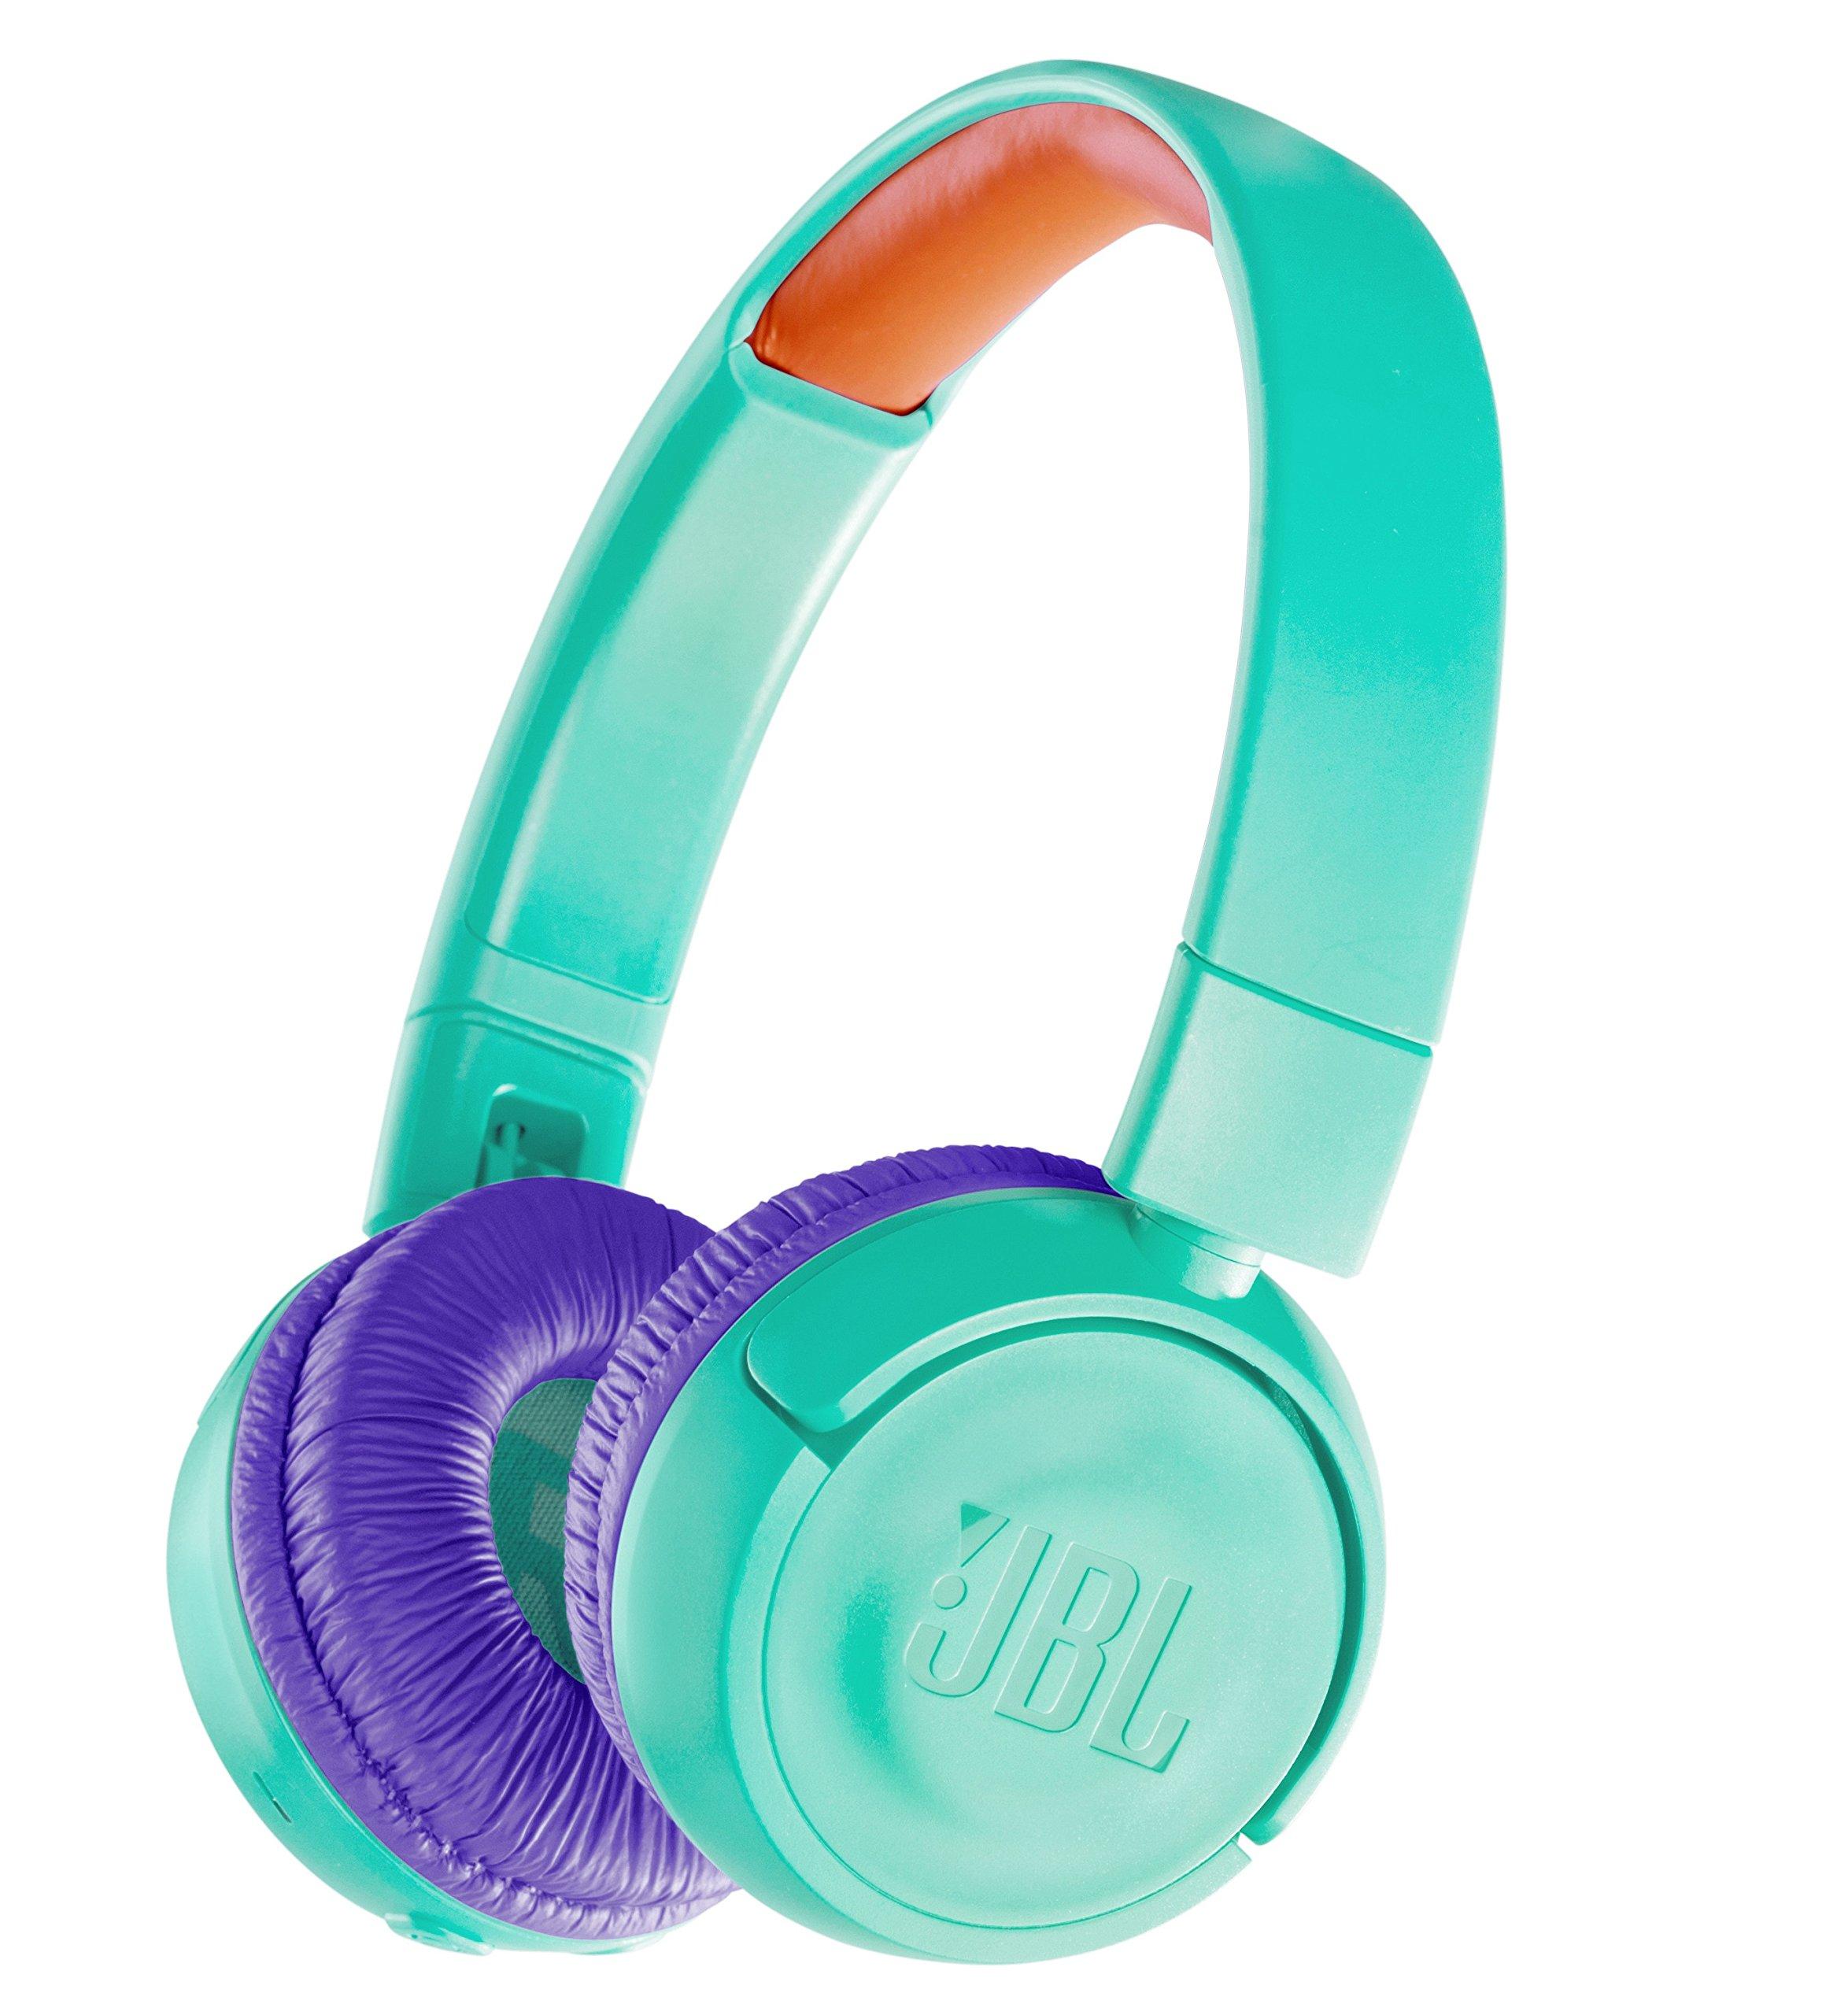 JBL音量調節機能付きヘッドフォン/カスタムステッカーJBLJR300BTTELワイヤレス(Bluetoothサポート)